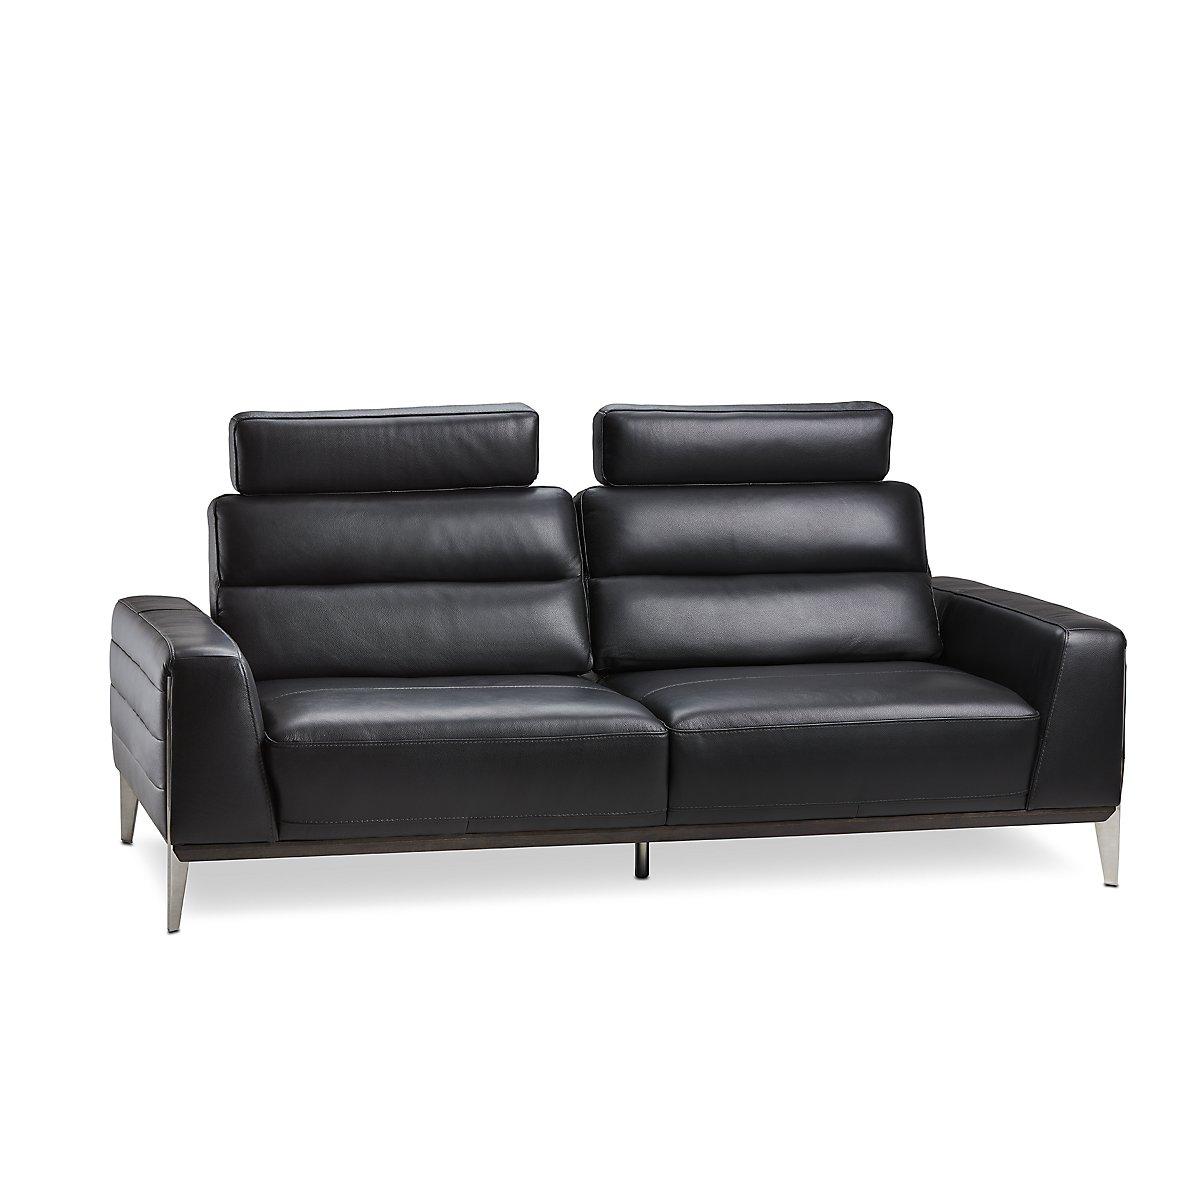 Gatlin Black Leather Power Push Back Sofa w/ Headrest | Living Room ...